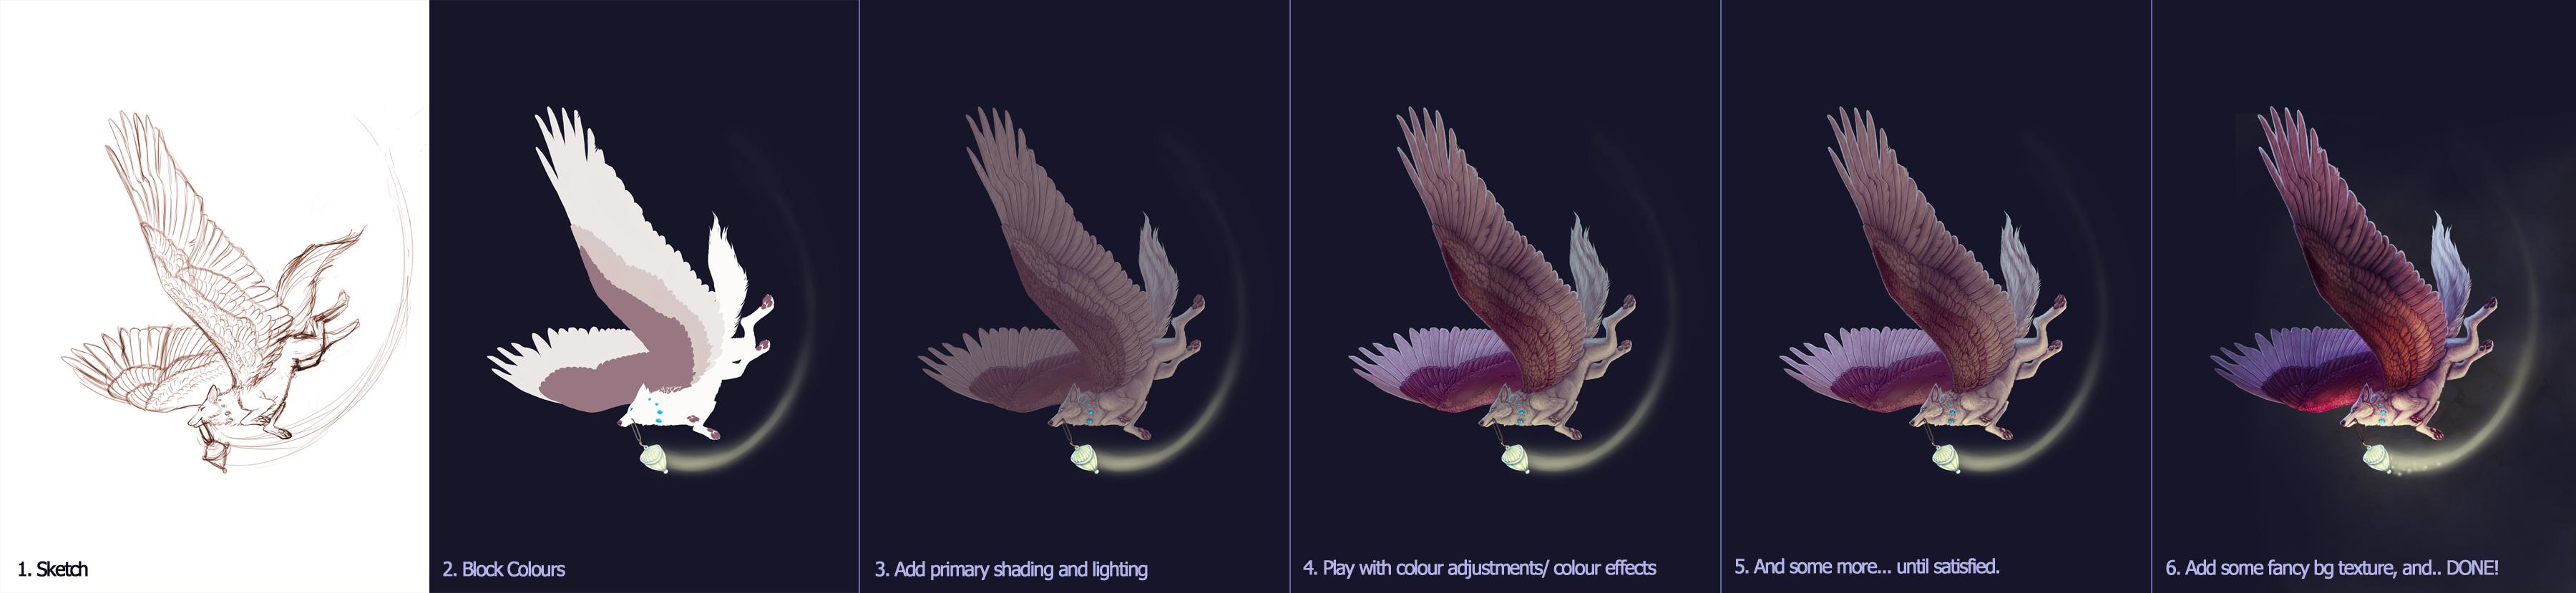 Light Bringer Process by francis-john